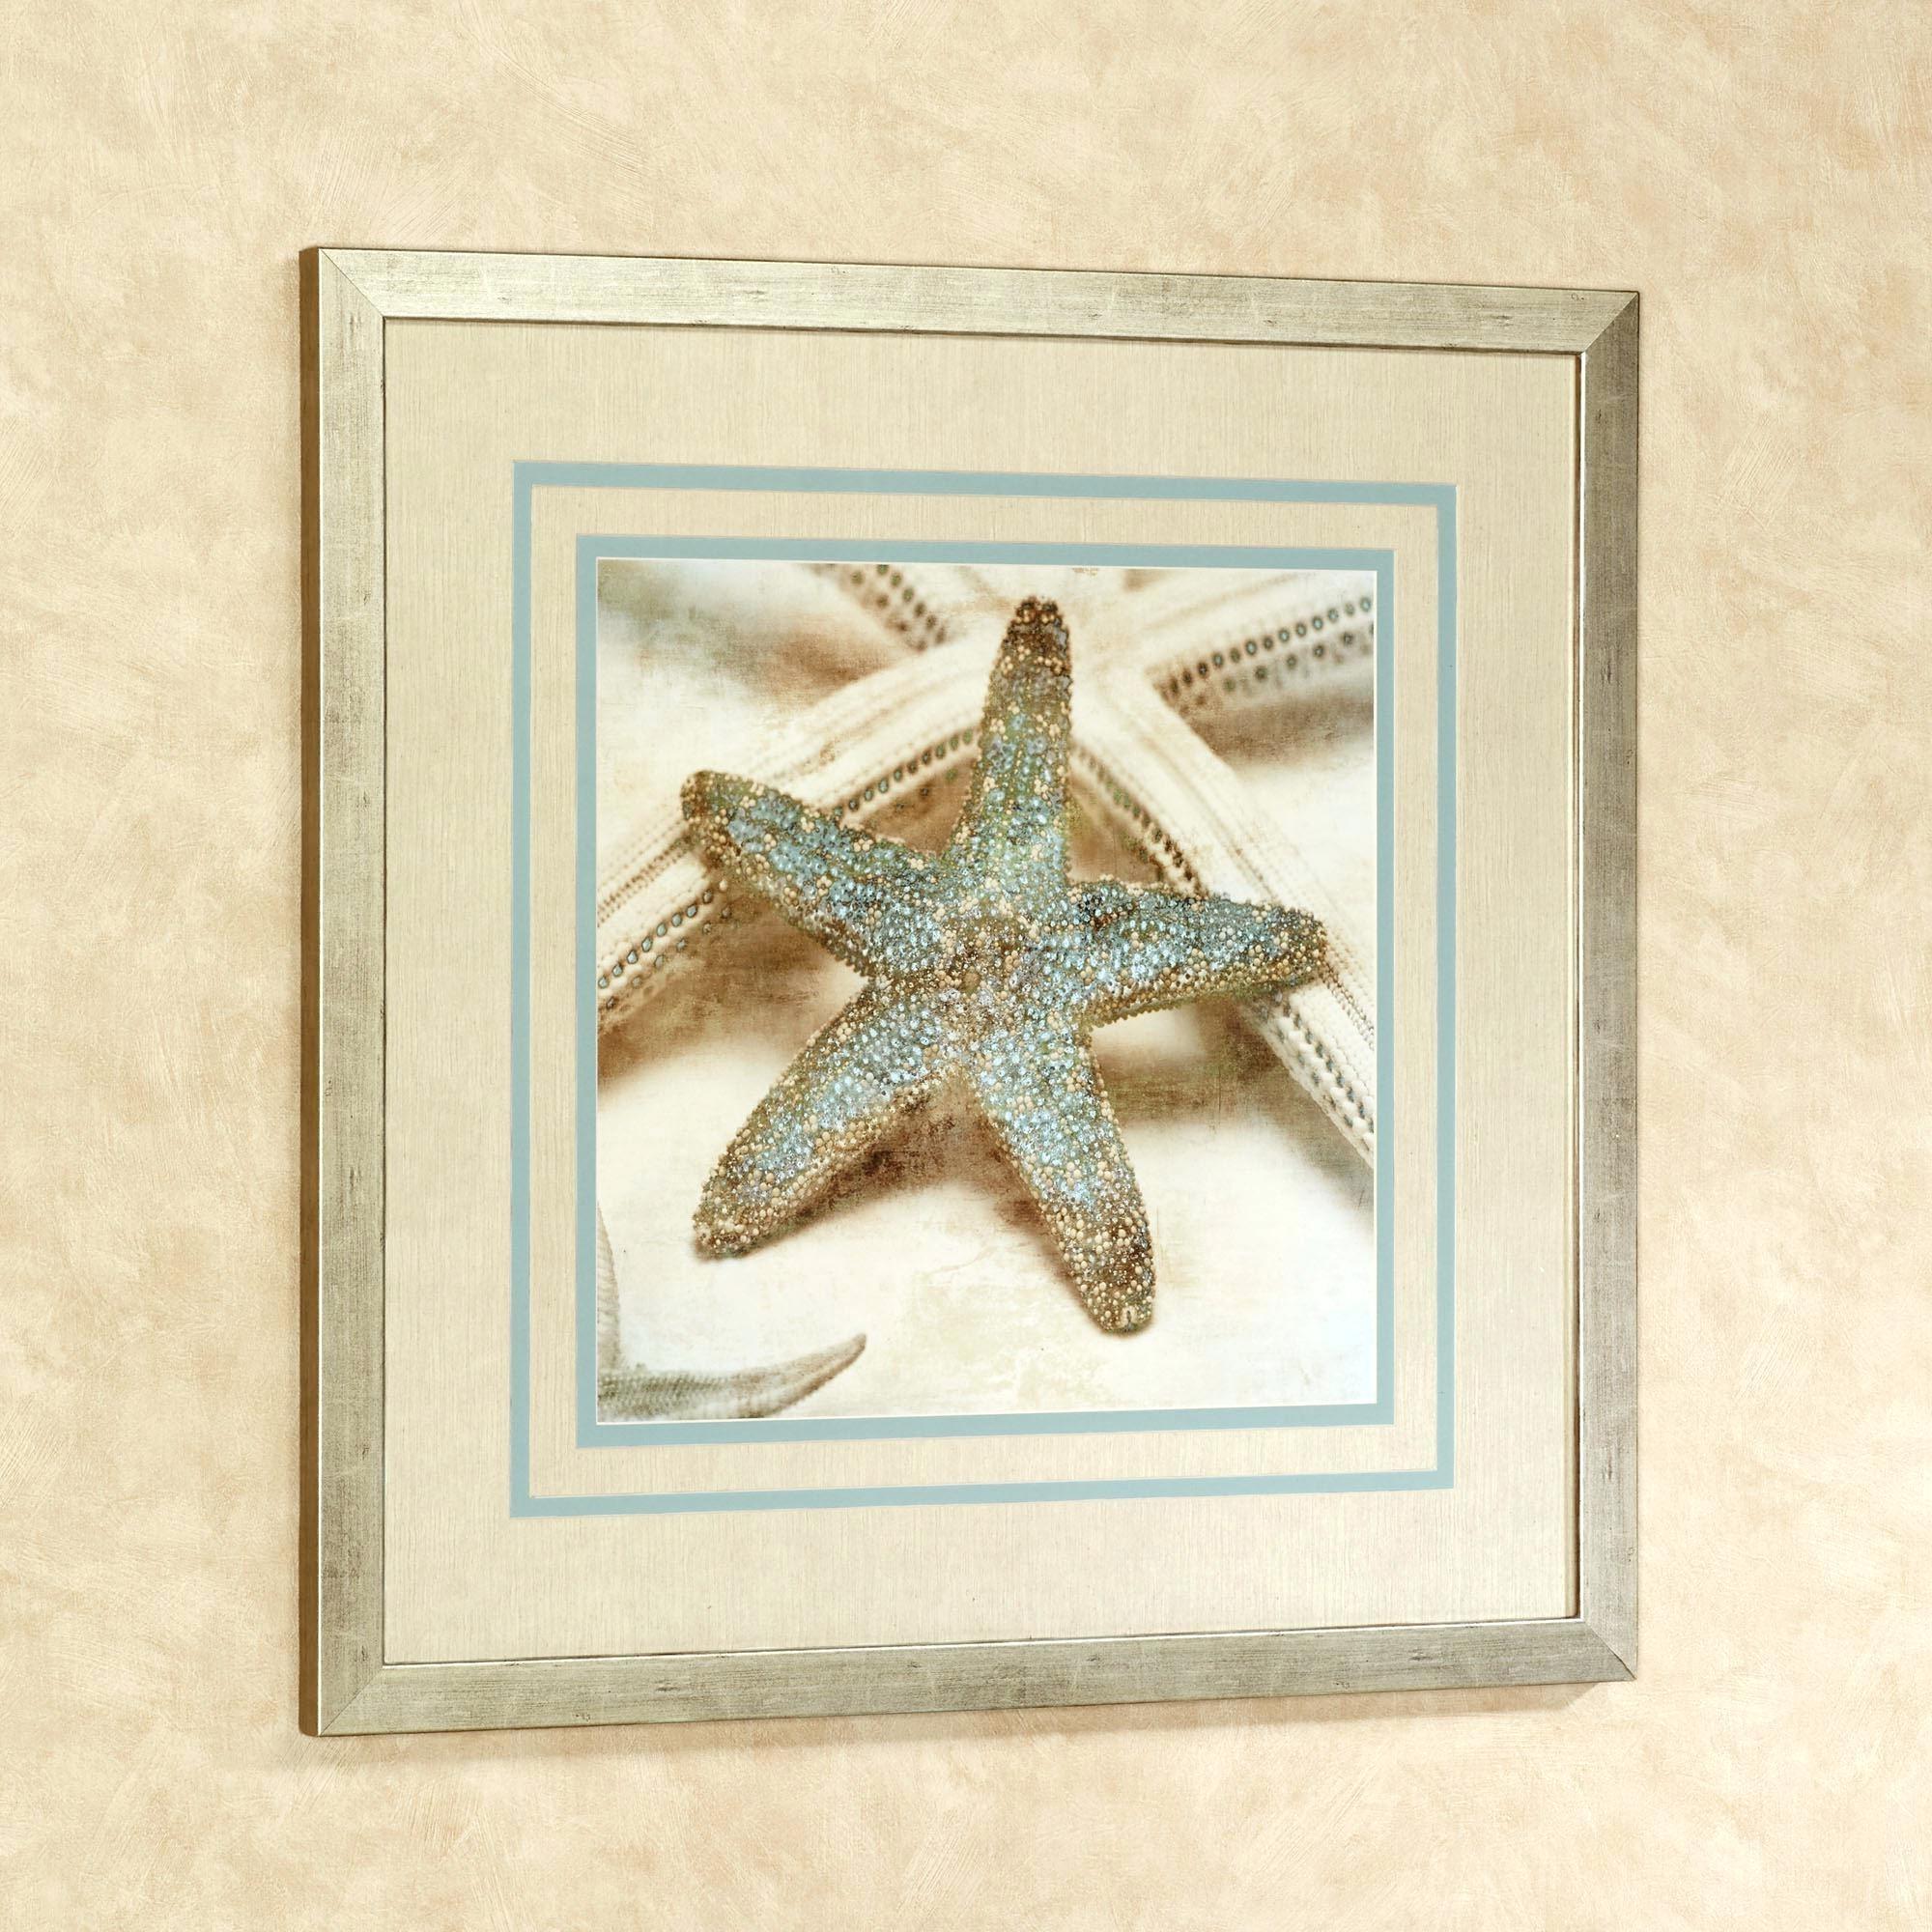 Newest Large White Starfish Wall Decor • Walls Decor With Regard To Large Starfish Wall Decors (View 6 of 15)